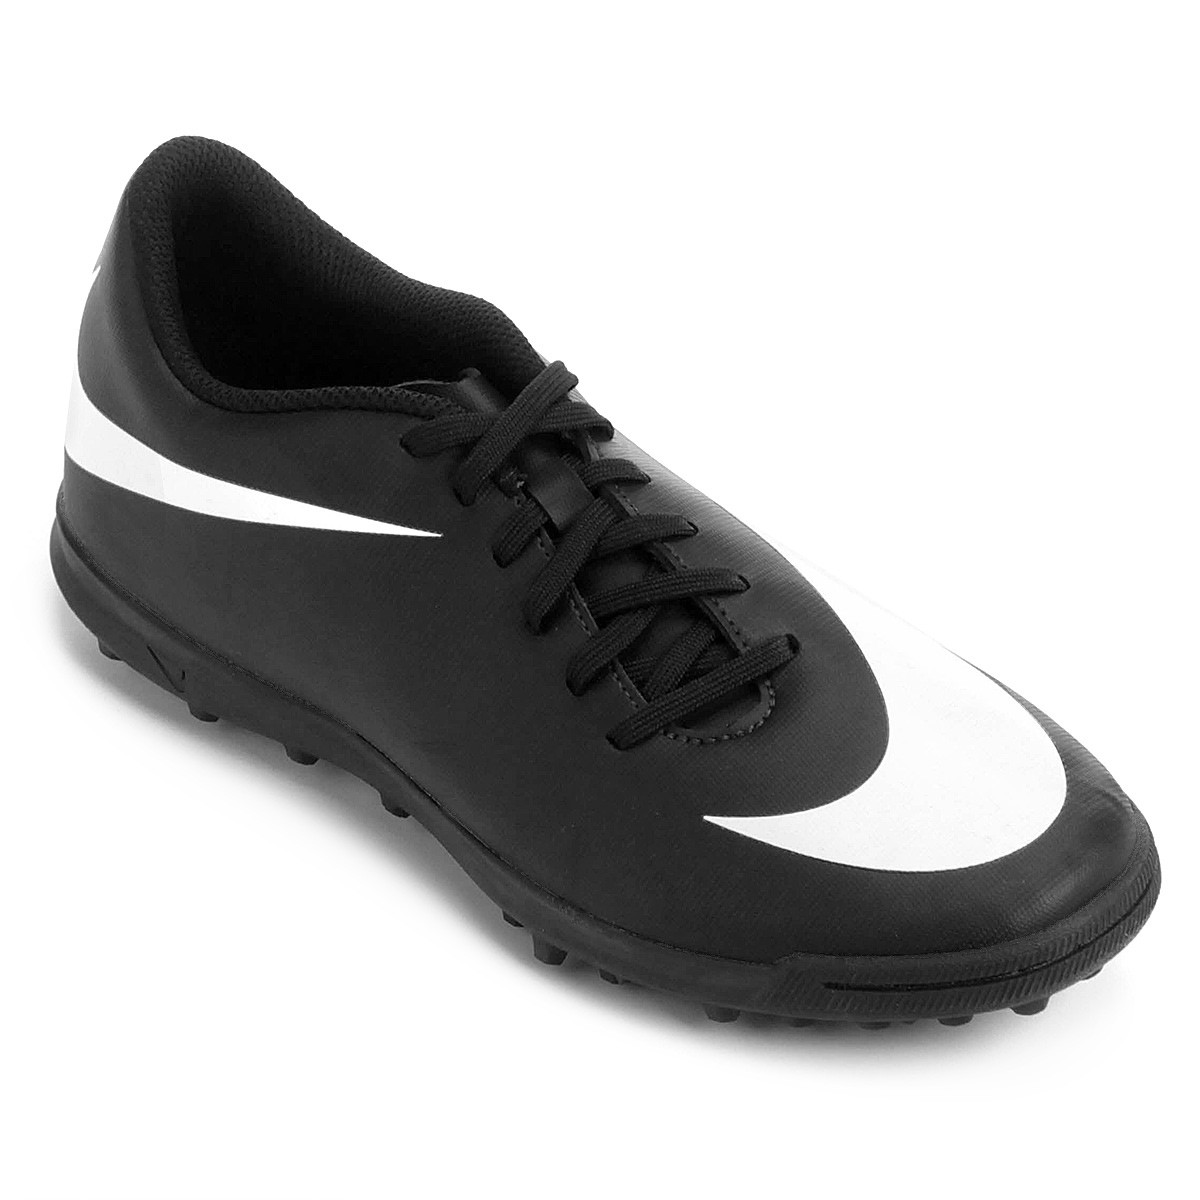 Chuteira Society Nike Bravata 2 TF - Preto e Branco